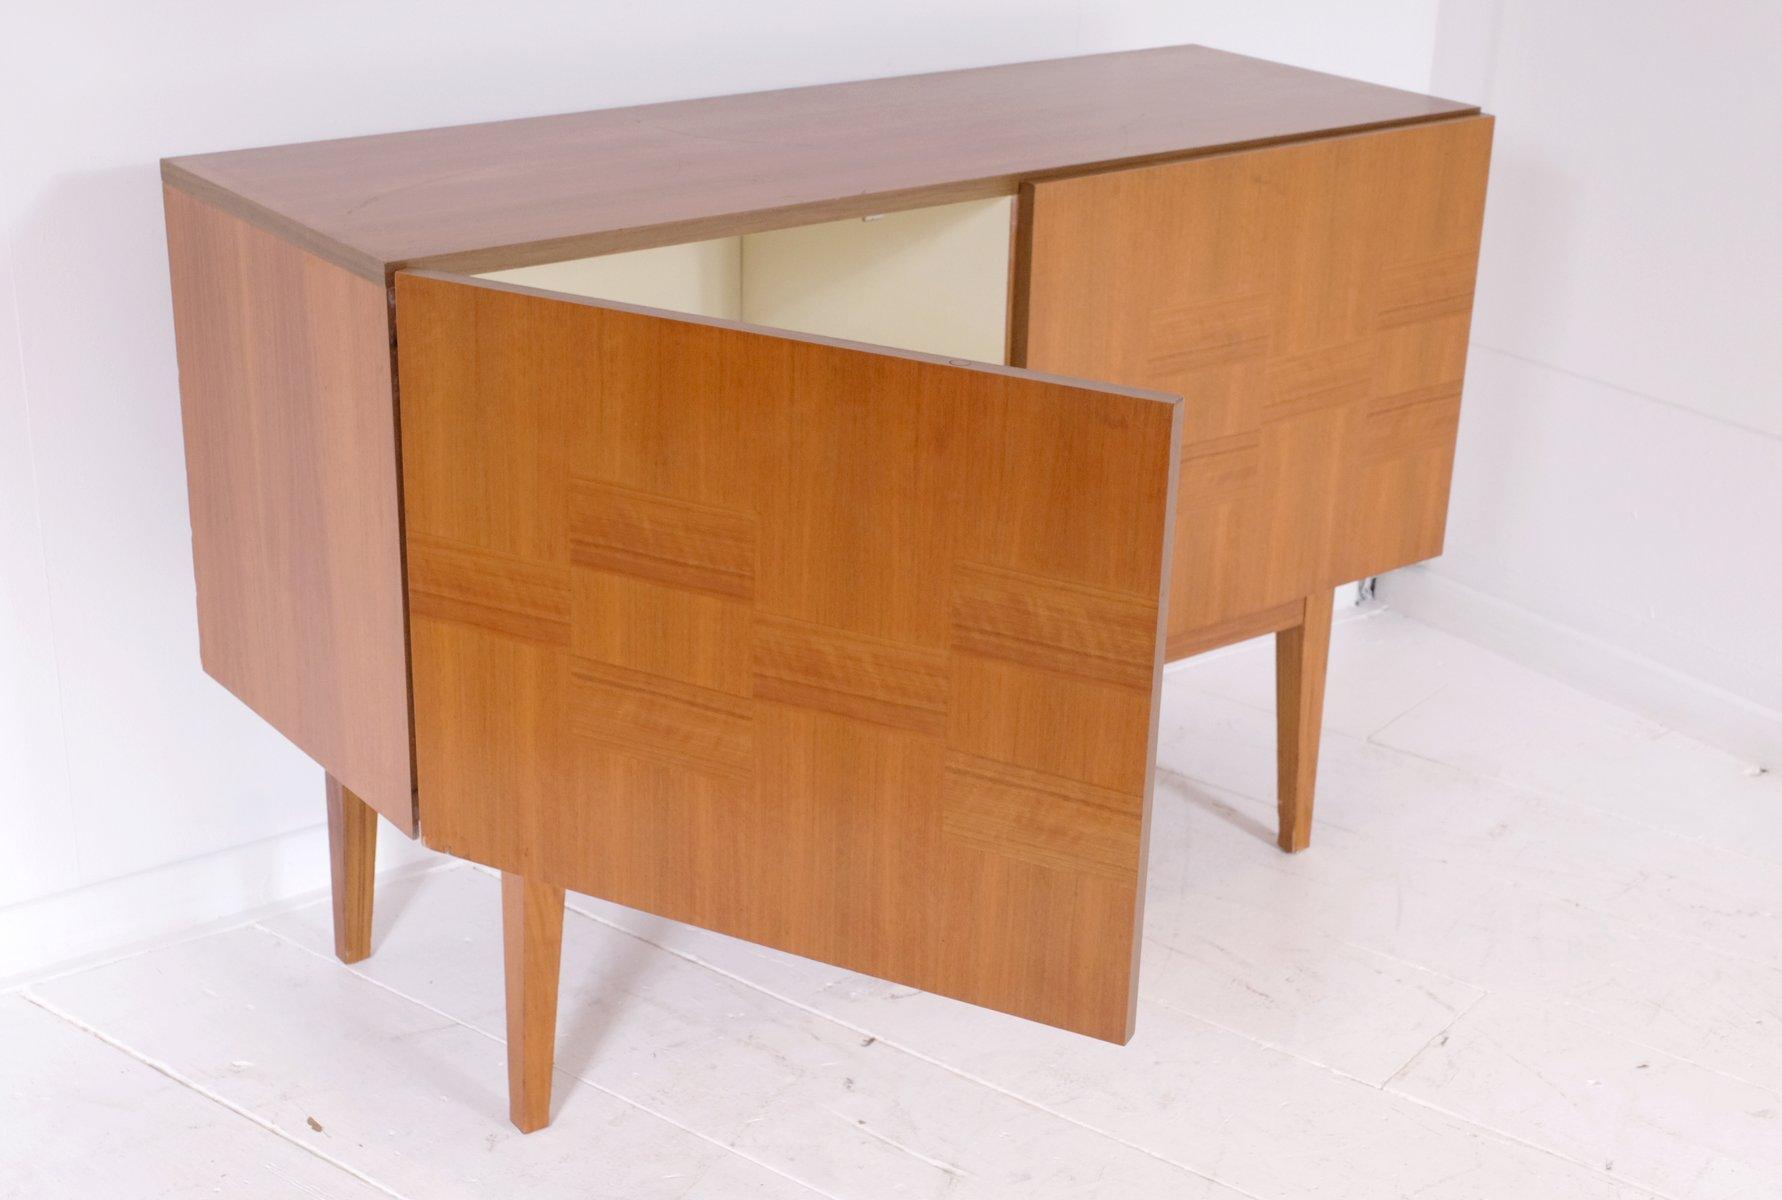 platanen sideboard 1970er bei pamono kaufen. Black Bedroom Furniture Sets. Home Design Ideas